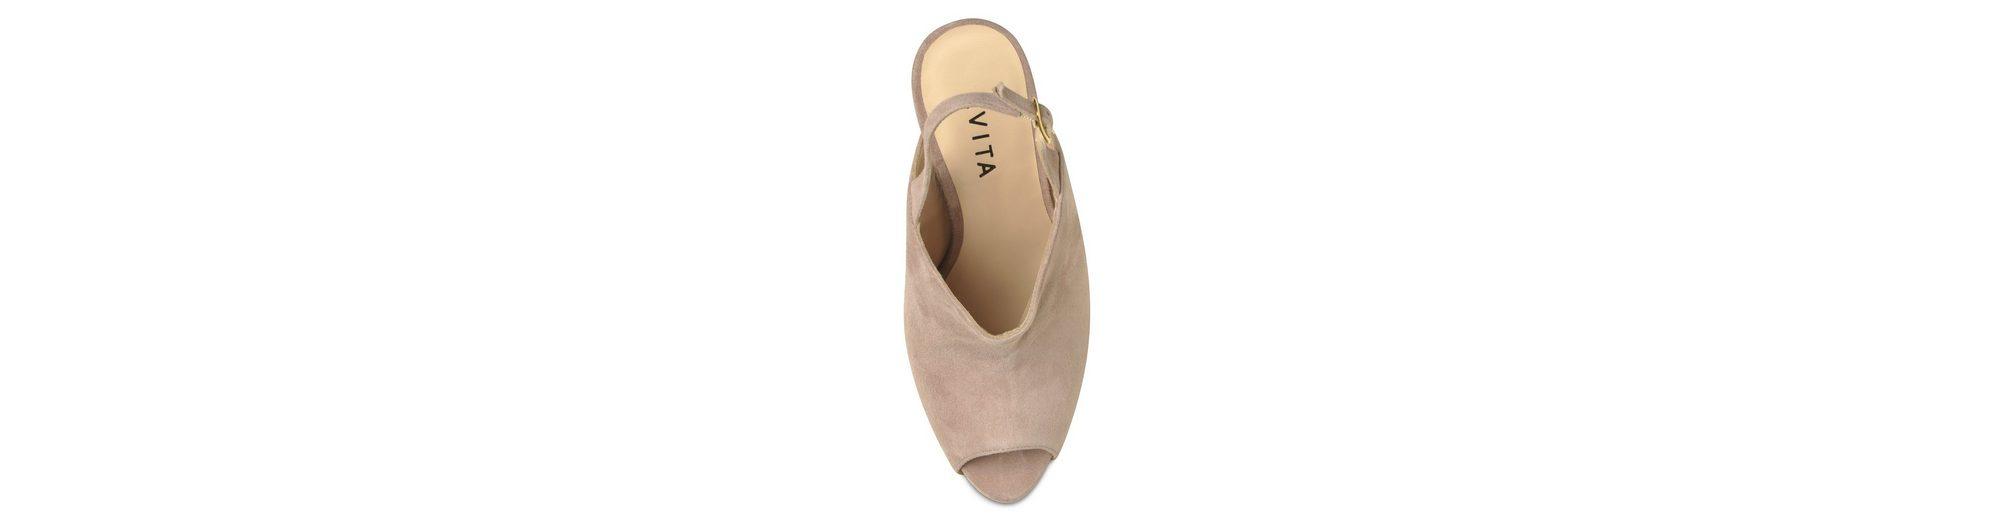 Evita BEPPINA Sandalette Rabatt Offiziell Große Überraschung Bester Verkauf Günstig Online Auslass 100% Original Online-Shop phGwE2